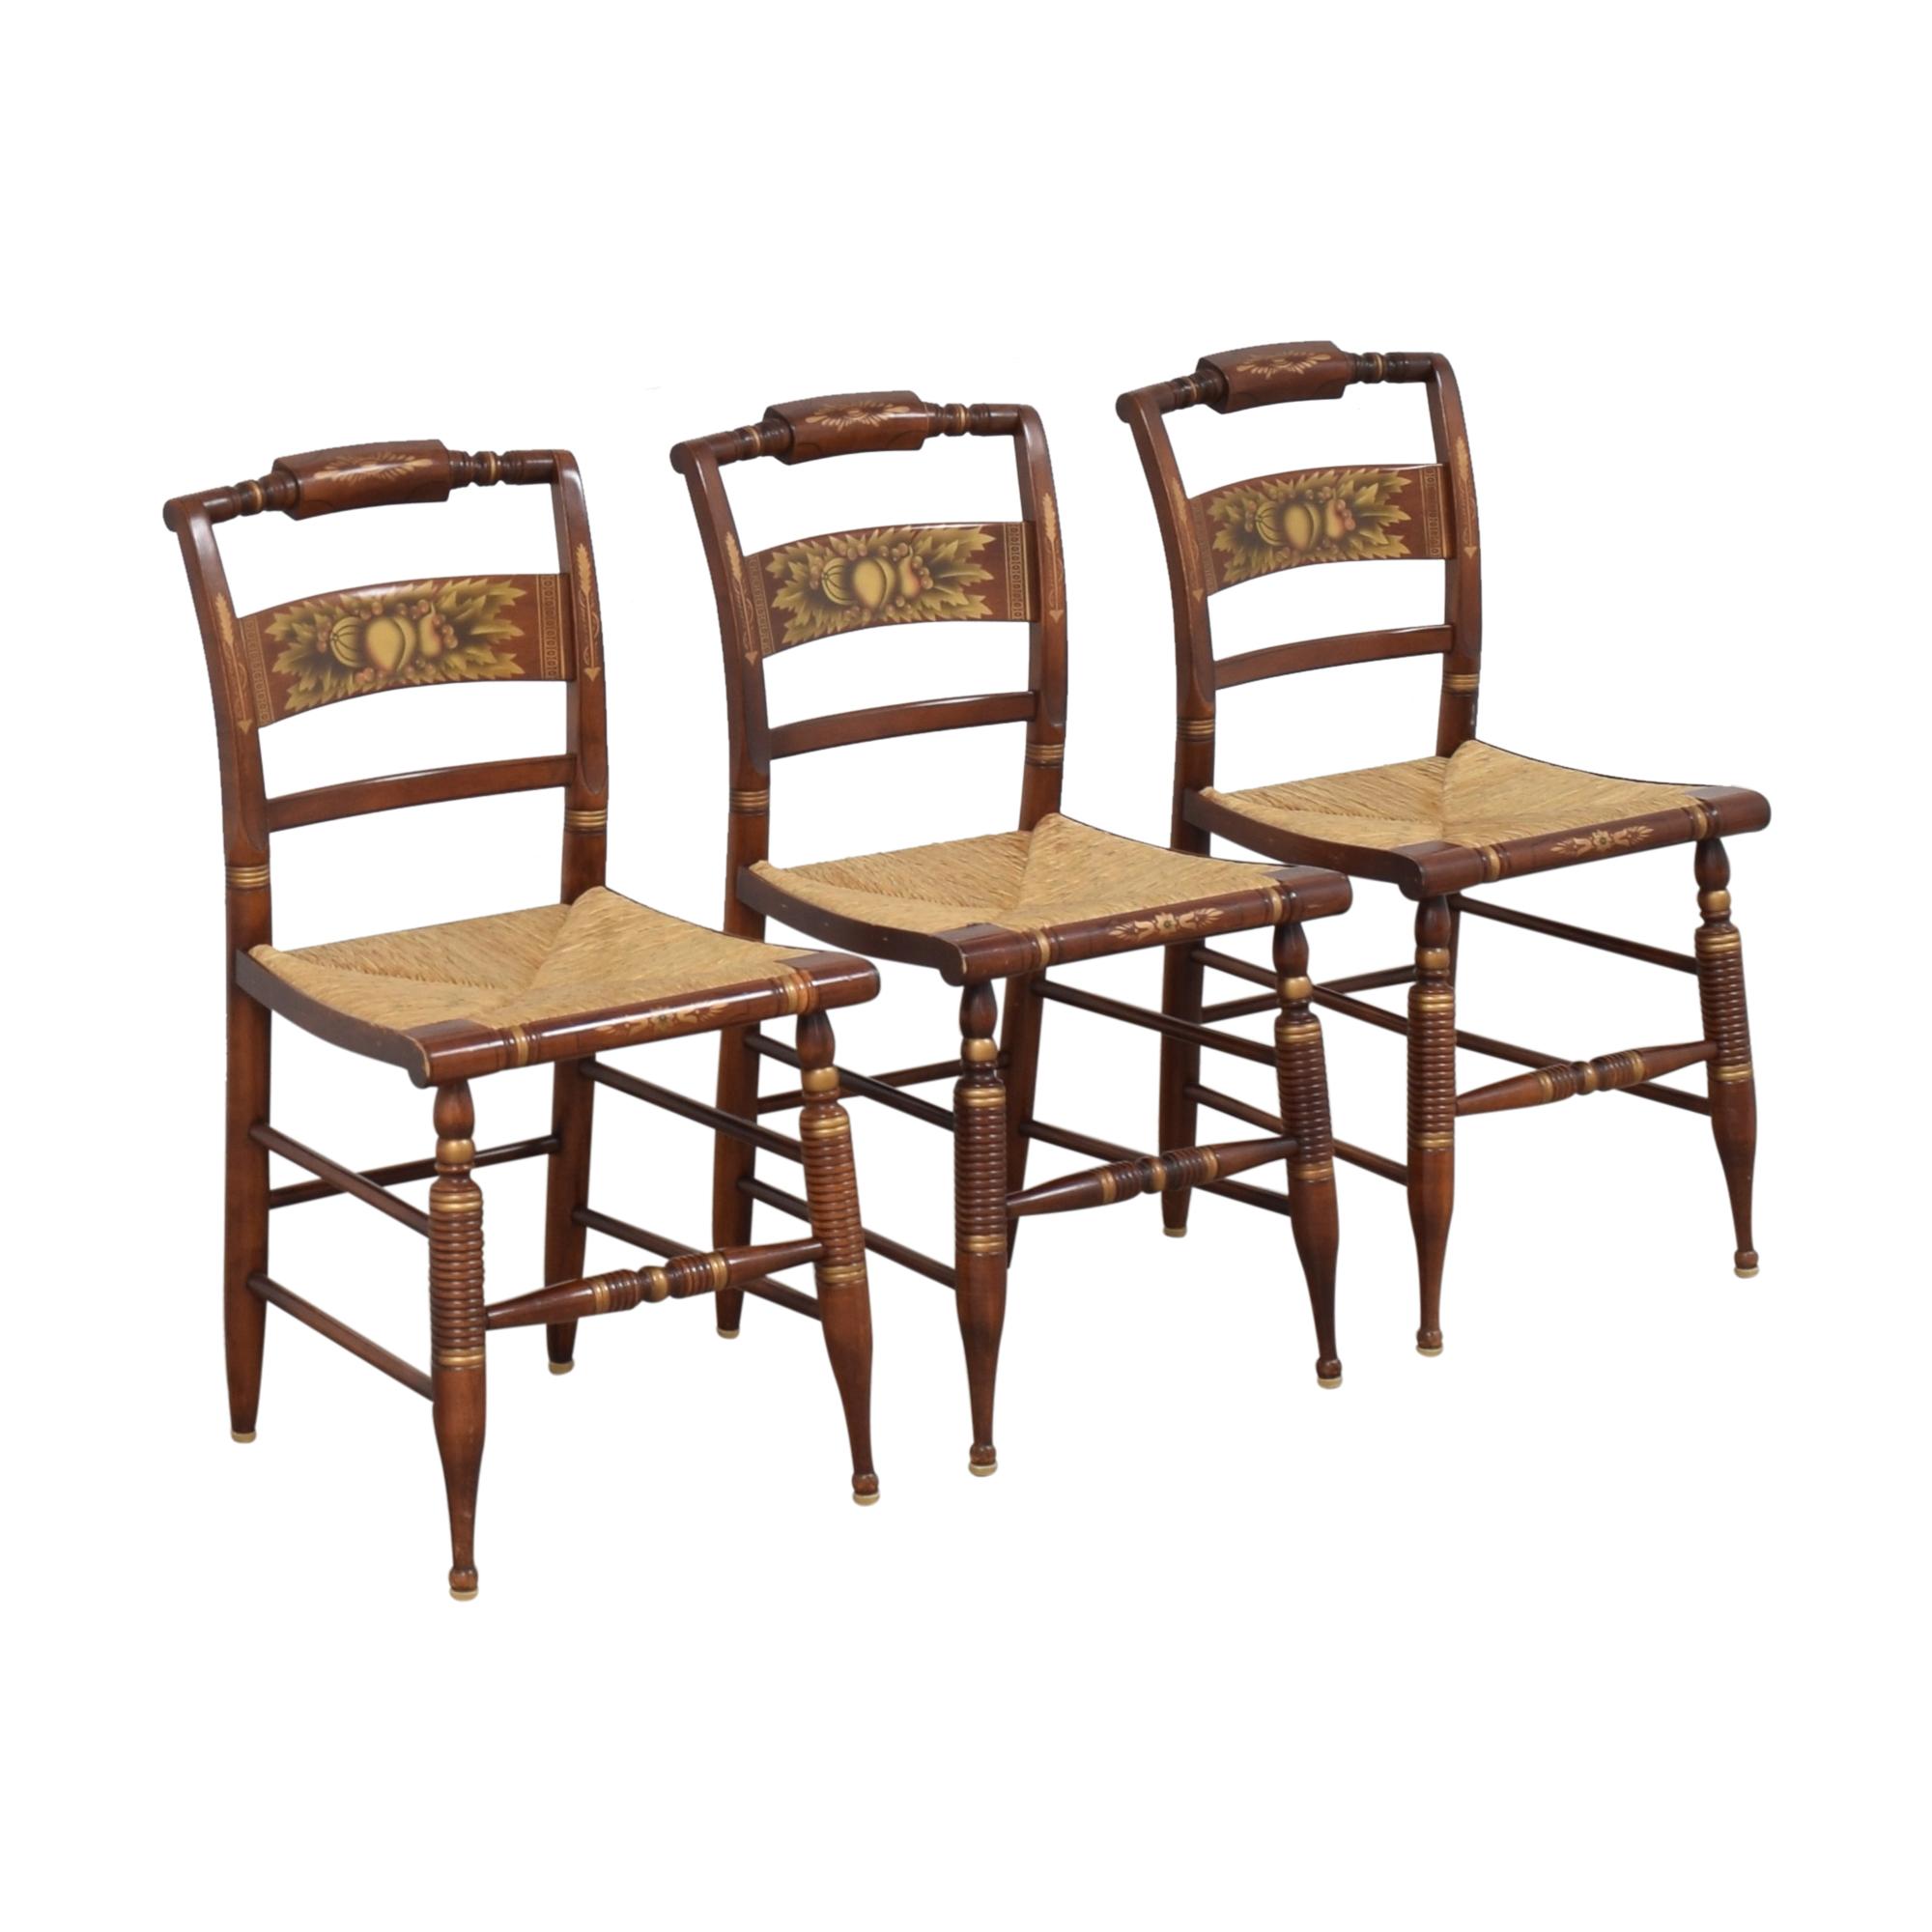 Lambert Hitchcock Lambert Hitchcock Cane Seat Dining Chairs on sale